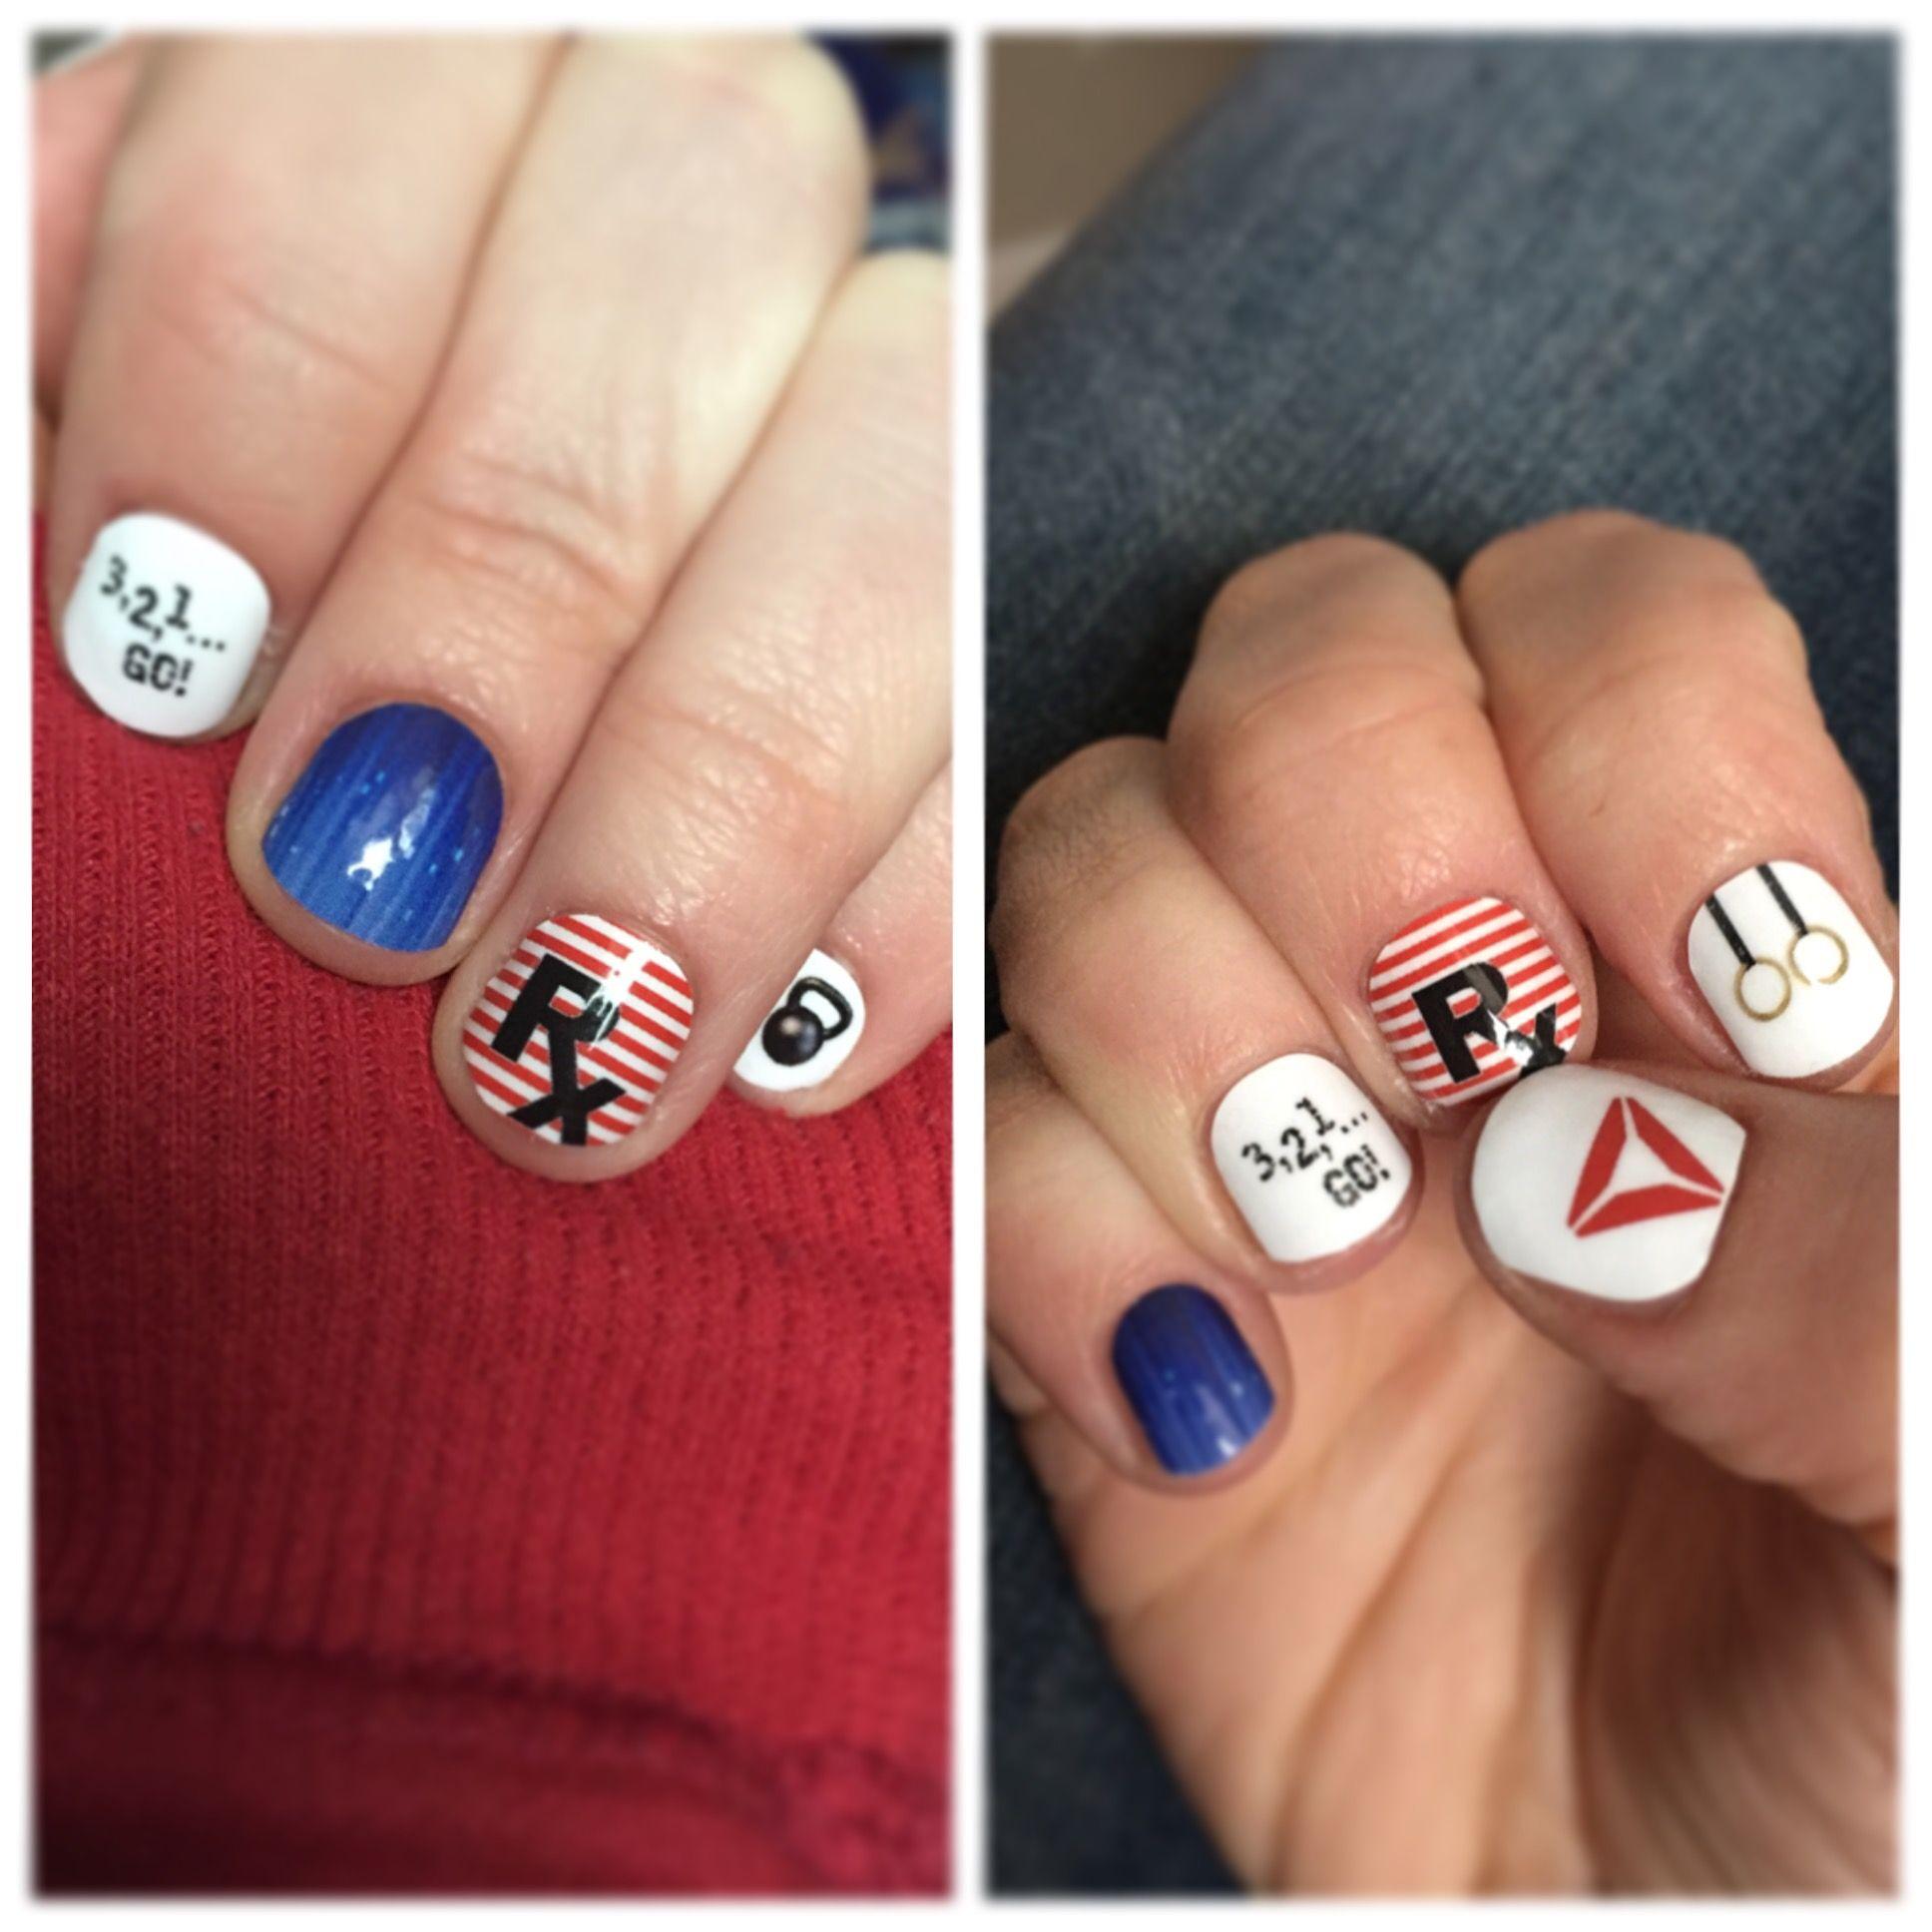 Nail Art Studio - custom Jamberry Nails - #Crossfit inspired - sossy ...